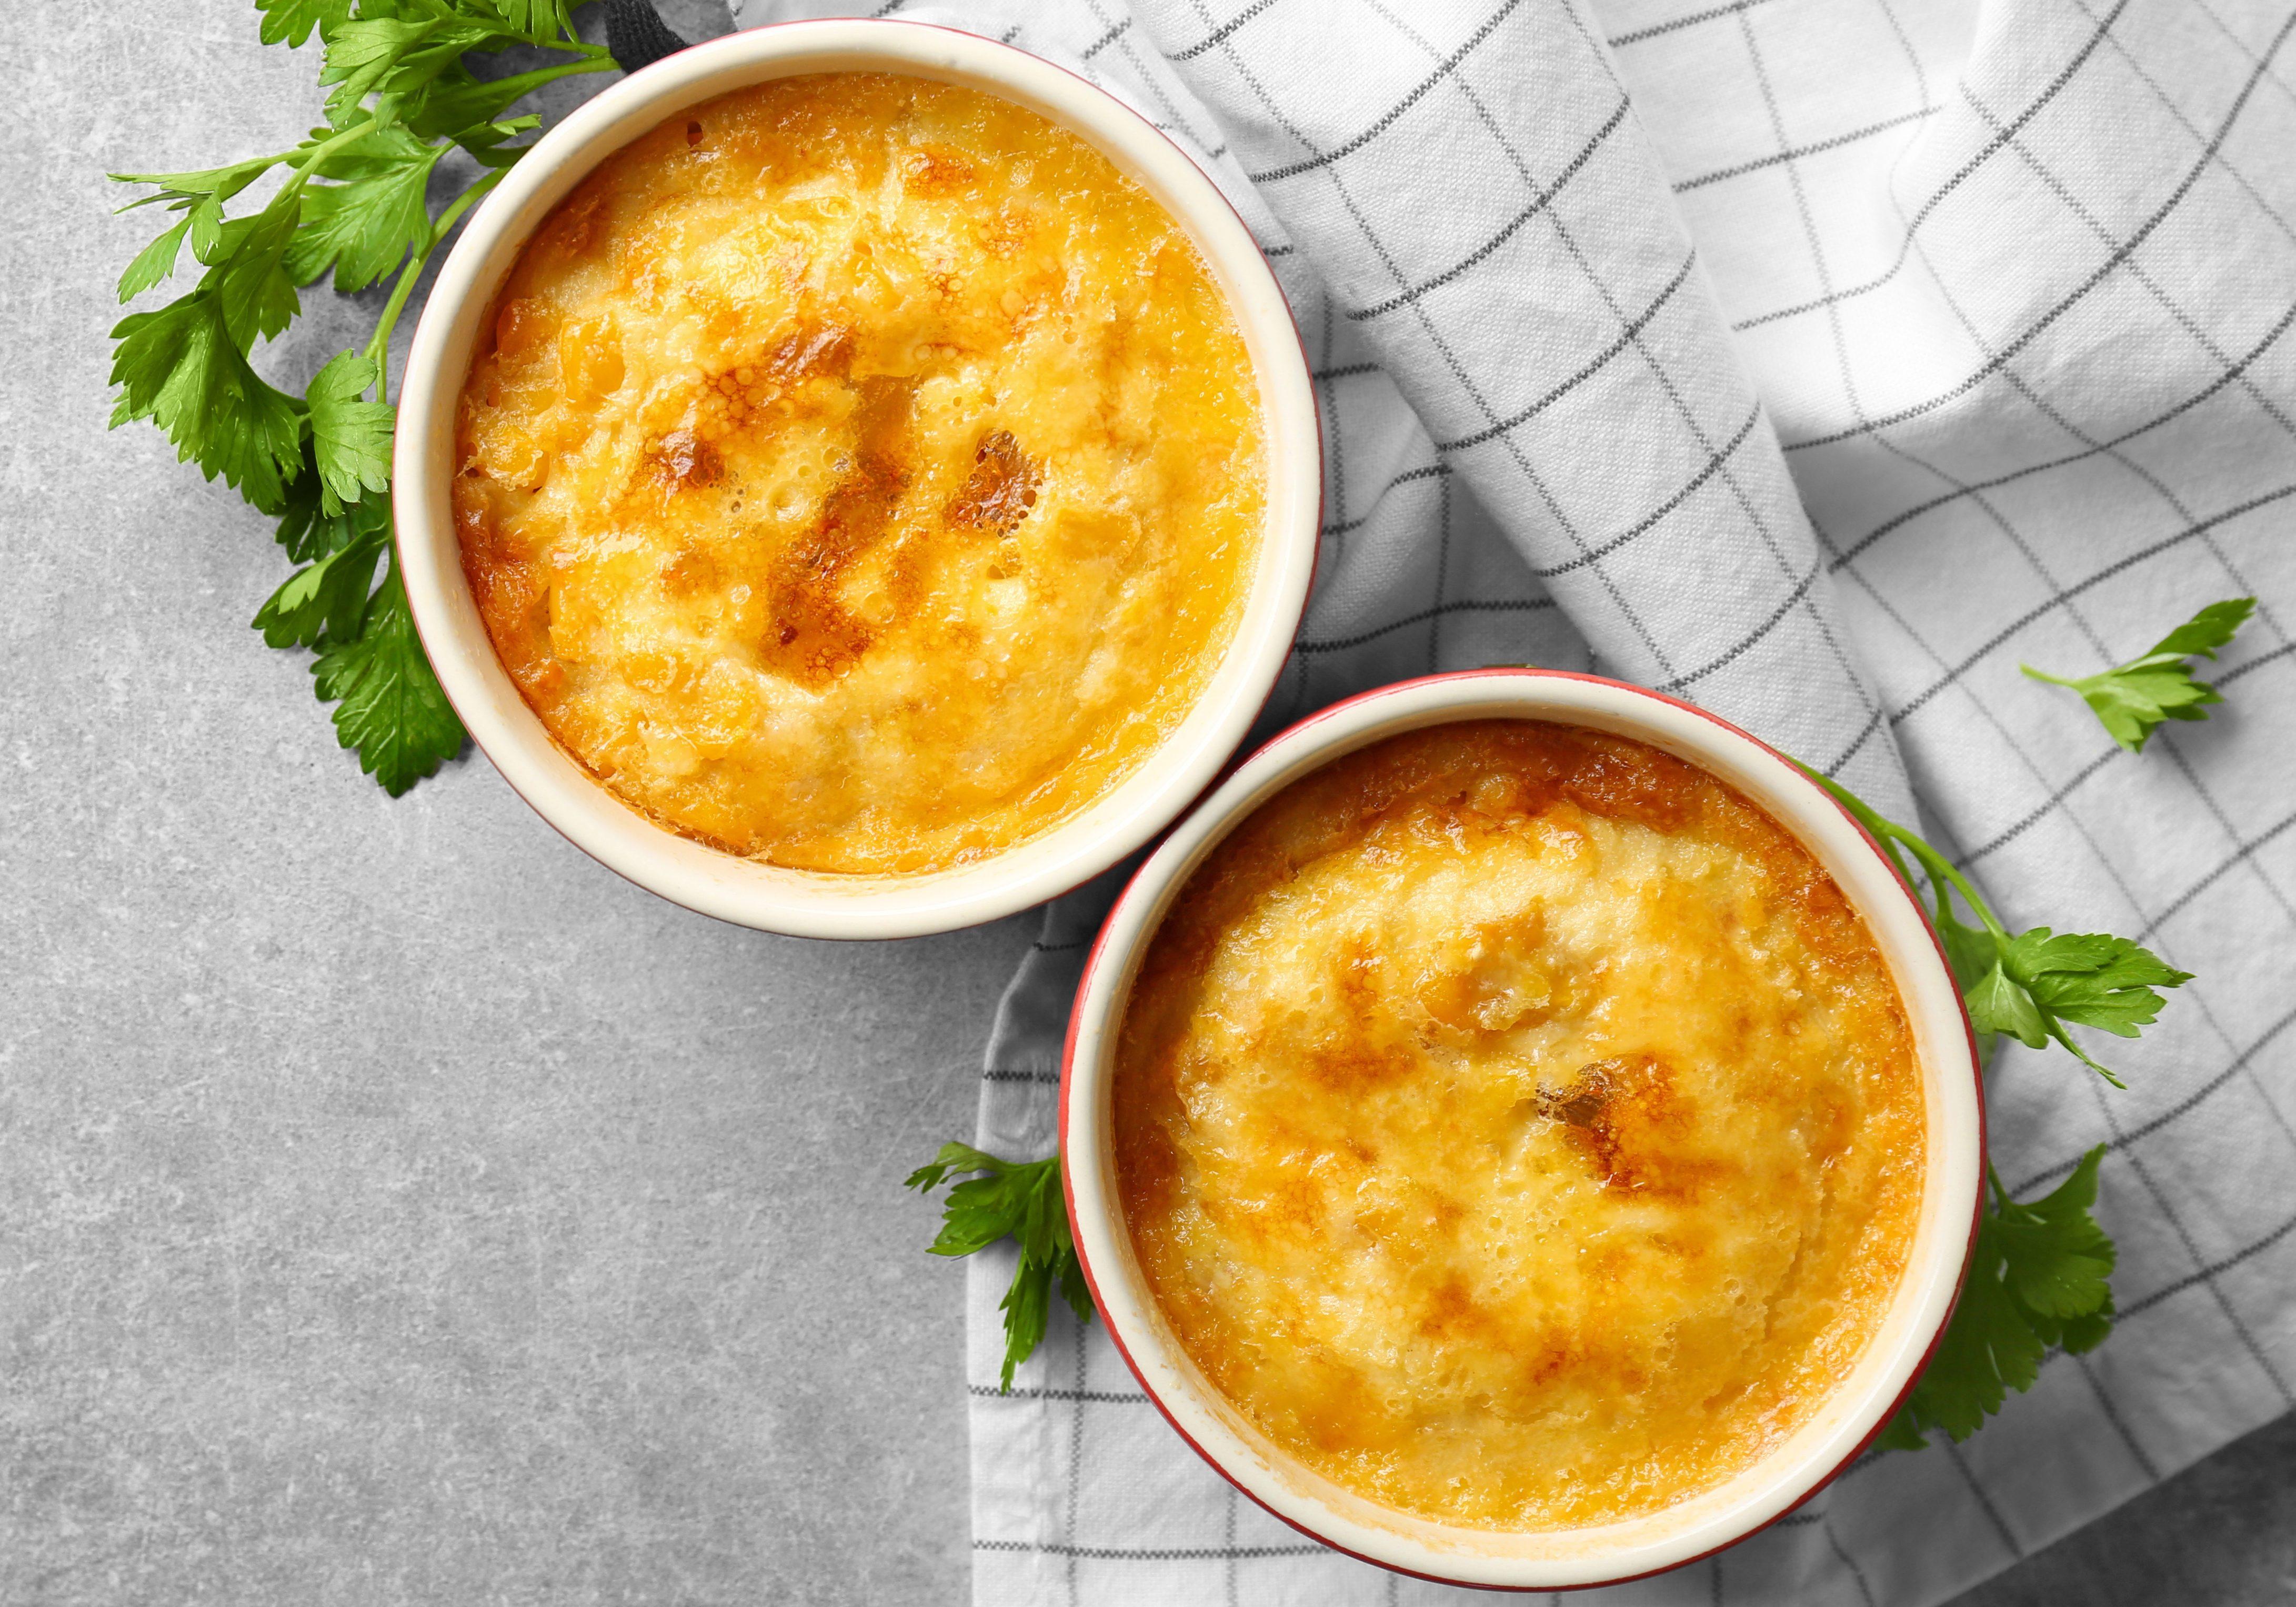 Ramekins with corn pudding on table